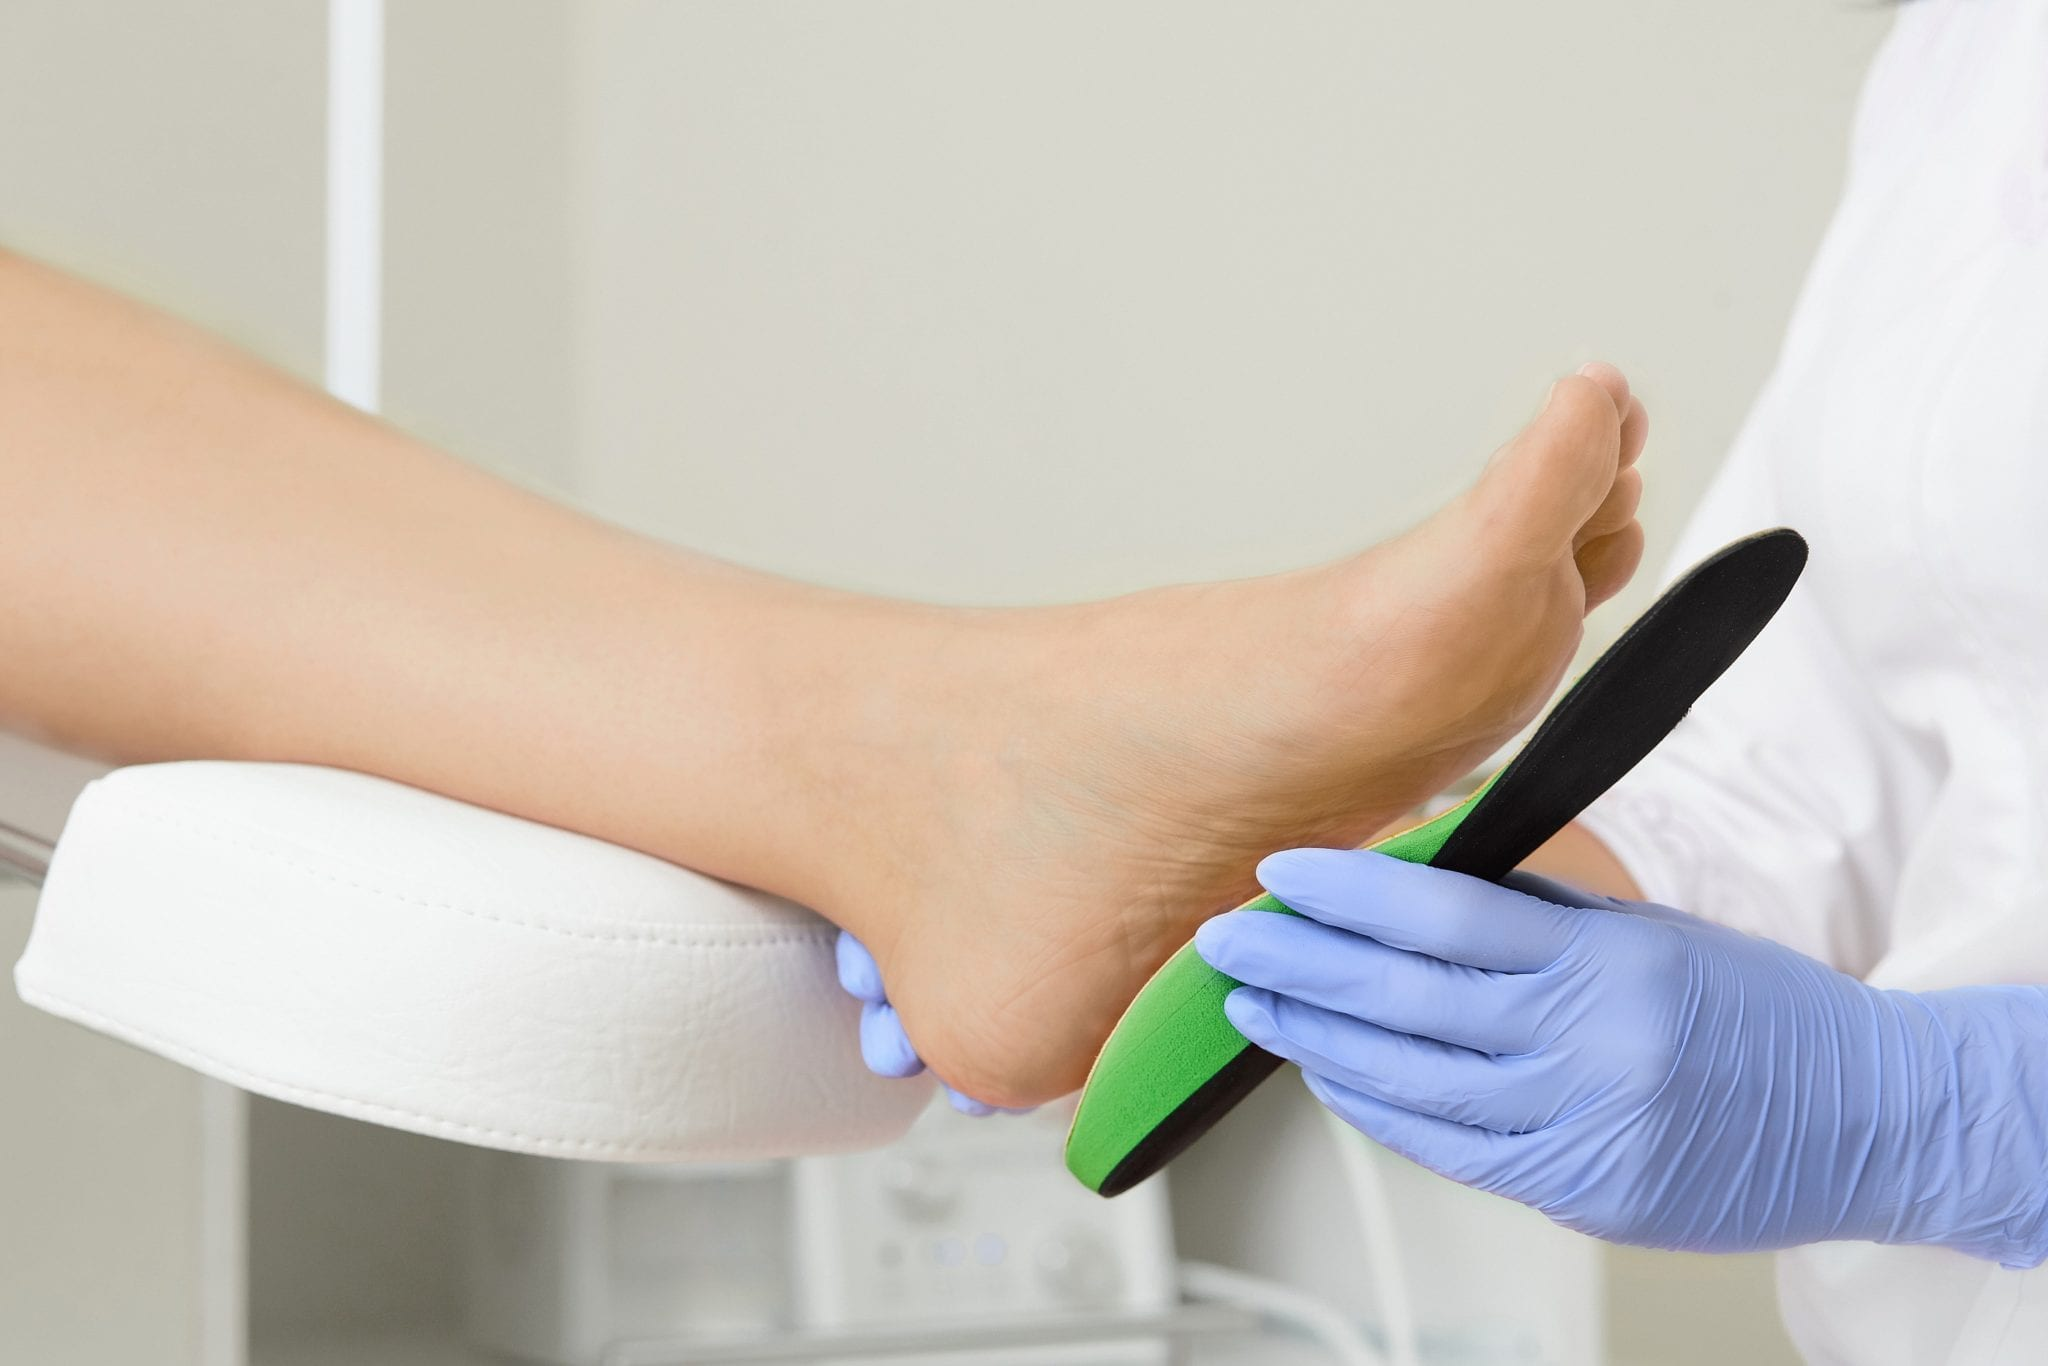 How do custom orthotics help heal your